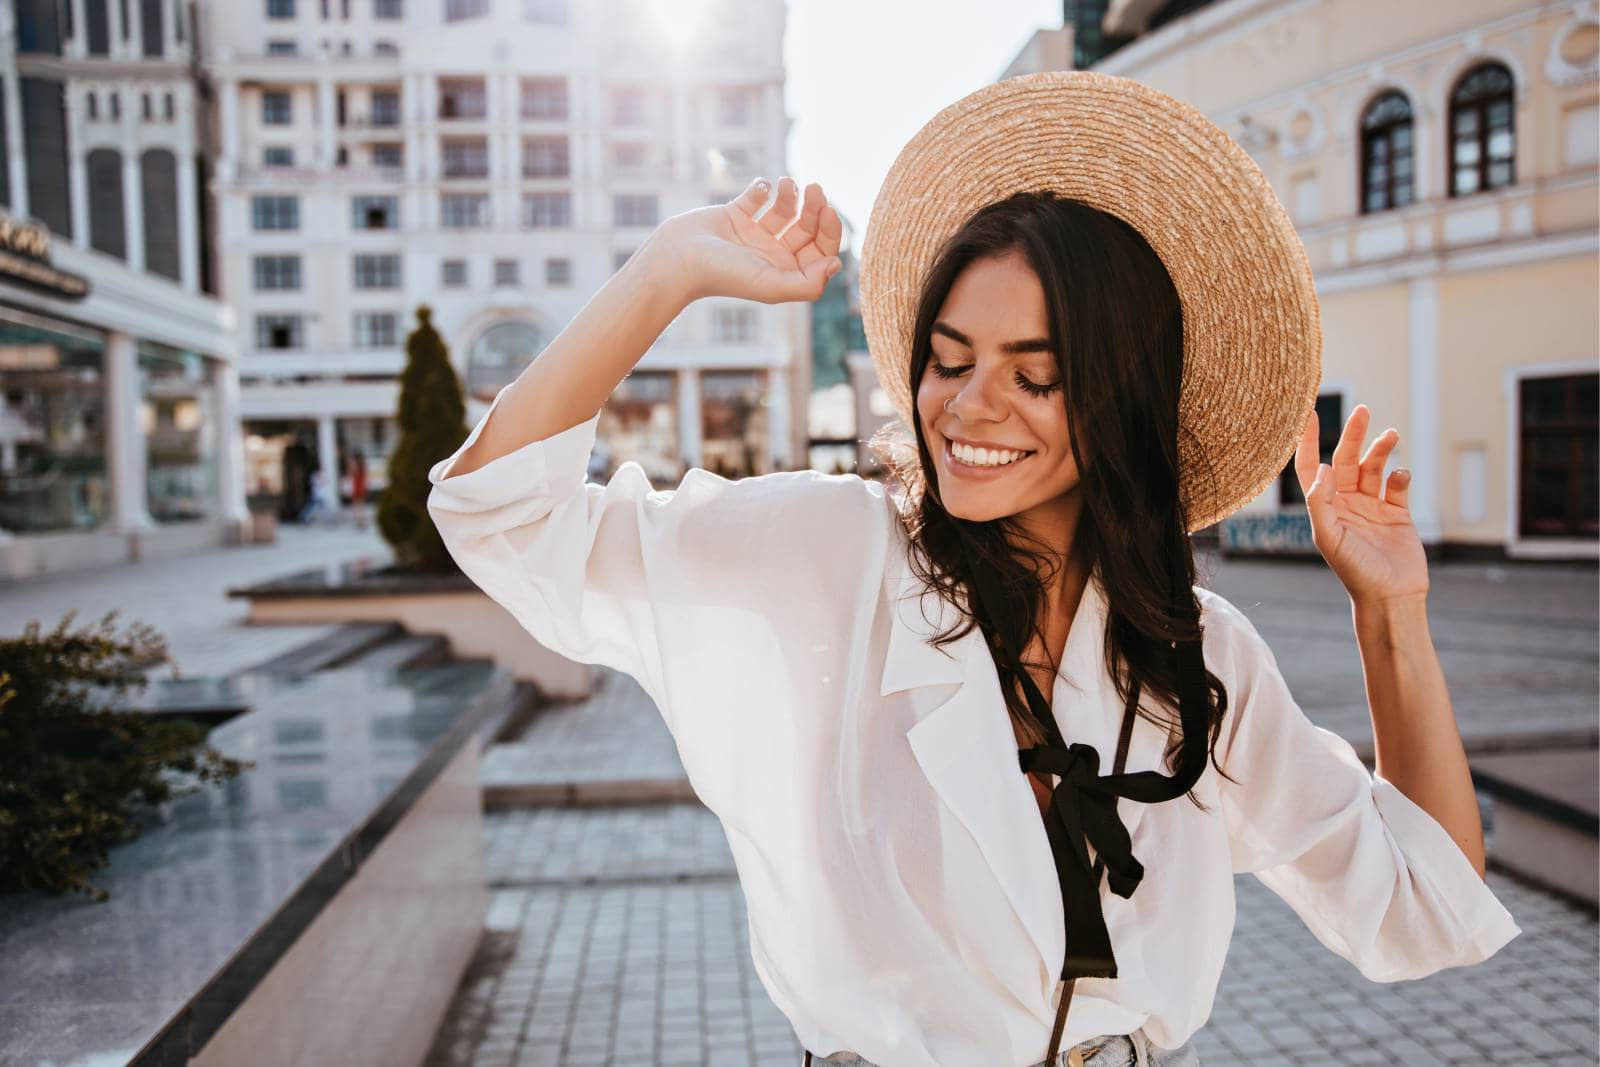 smiling woman outside wearing hat